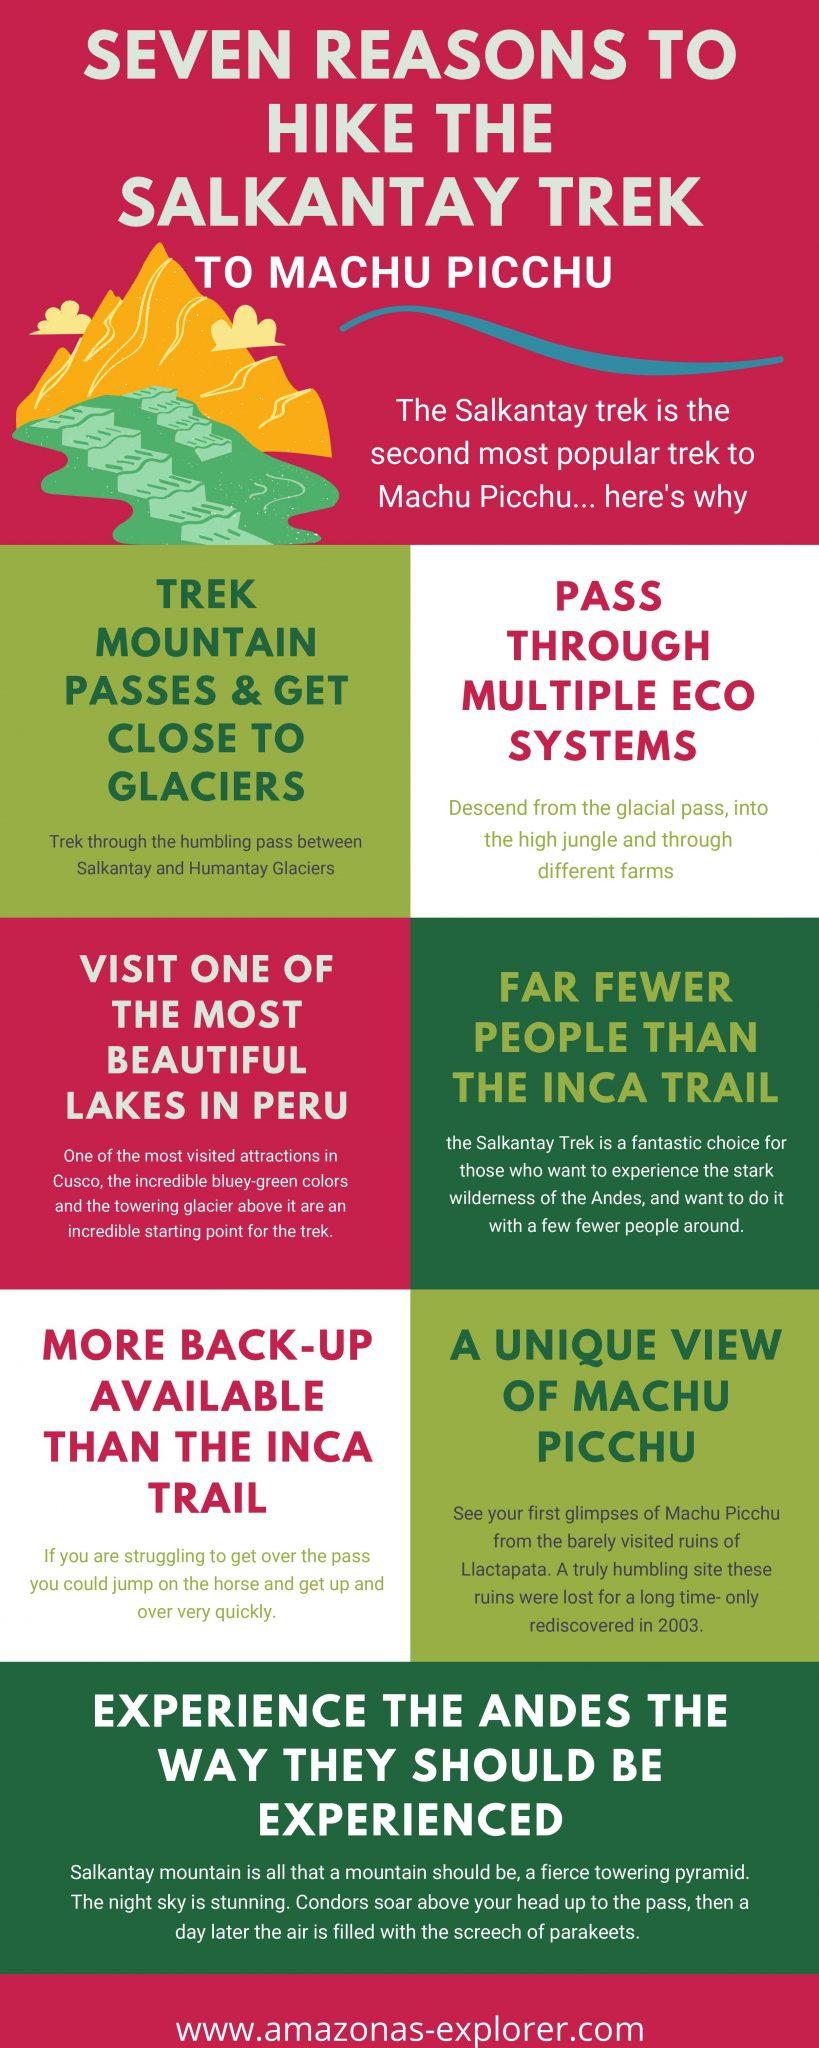 7 reasons to hike the salkantay trek